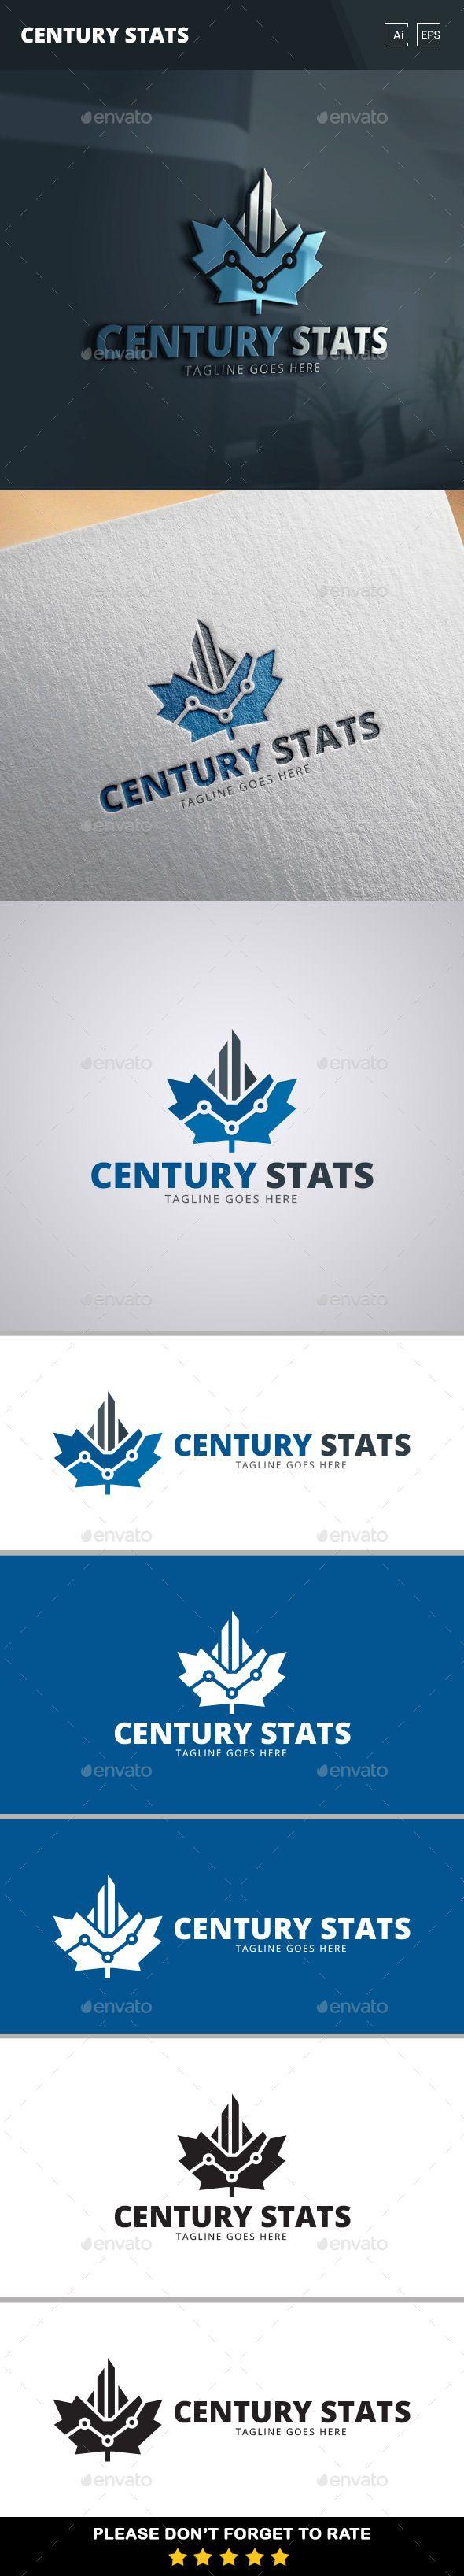 Century Stats Logo Template   Corporate Identity   Pinterest